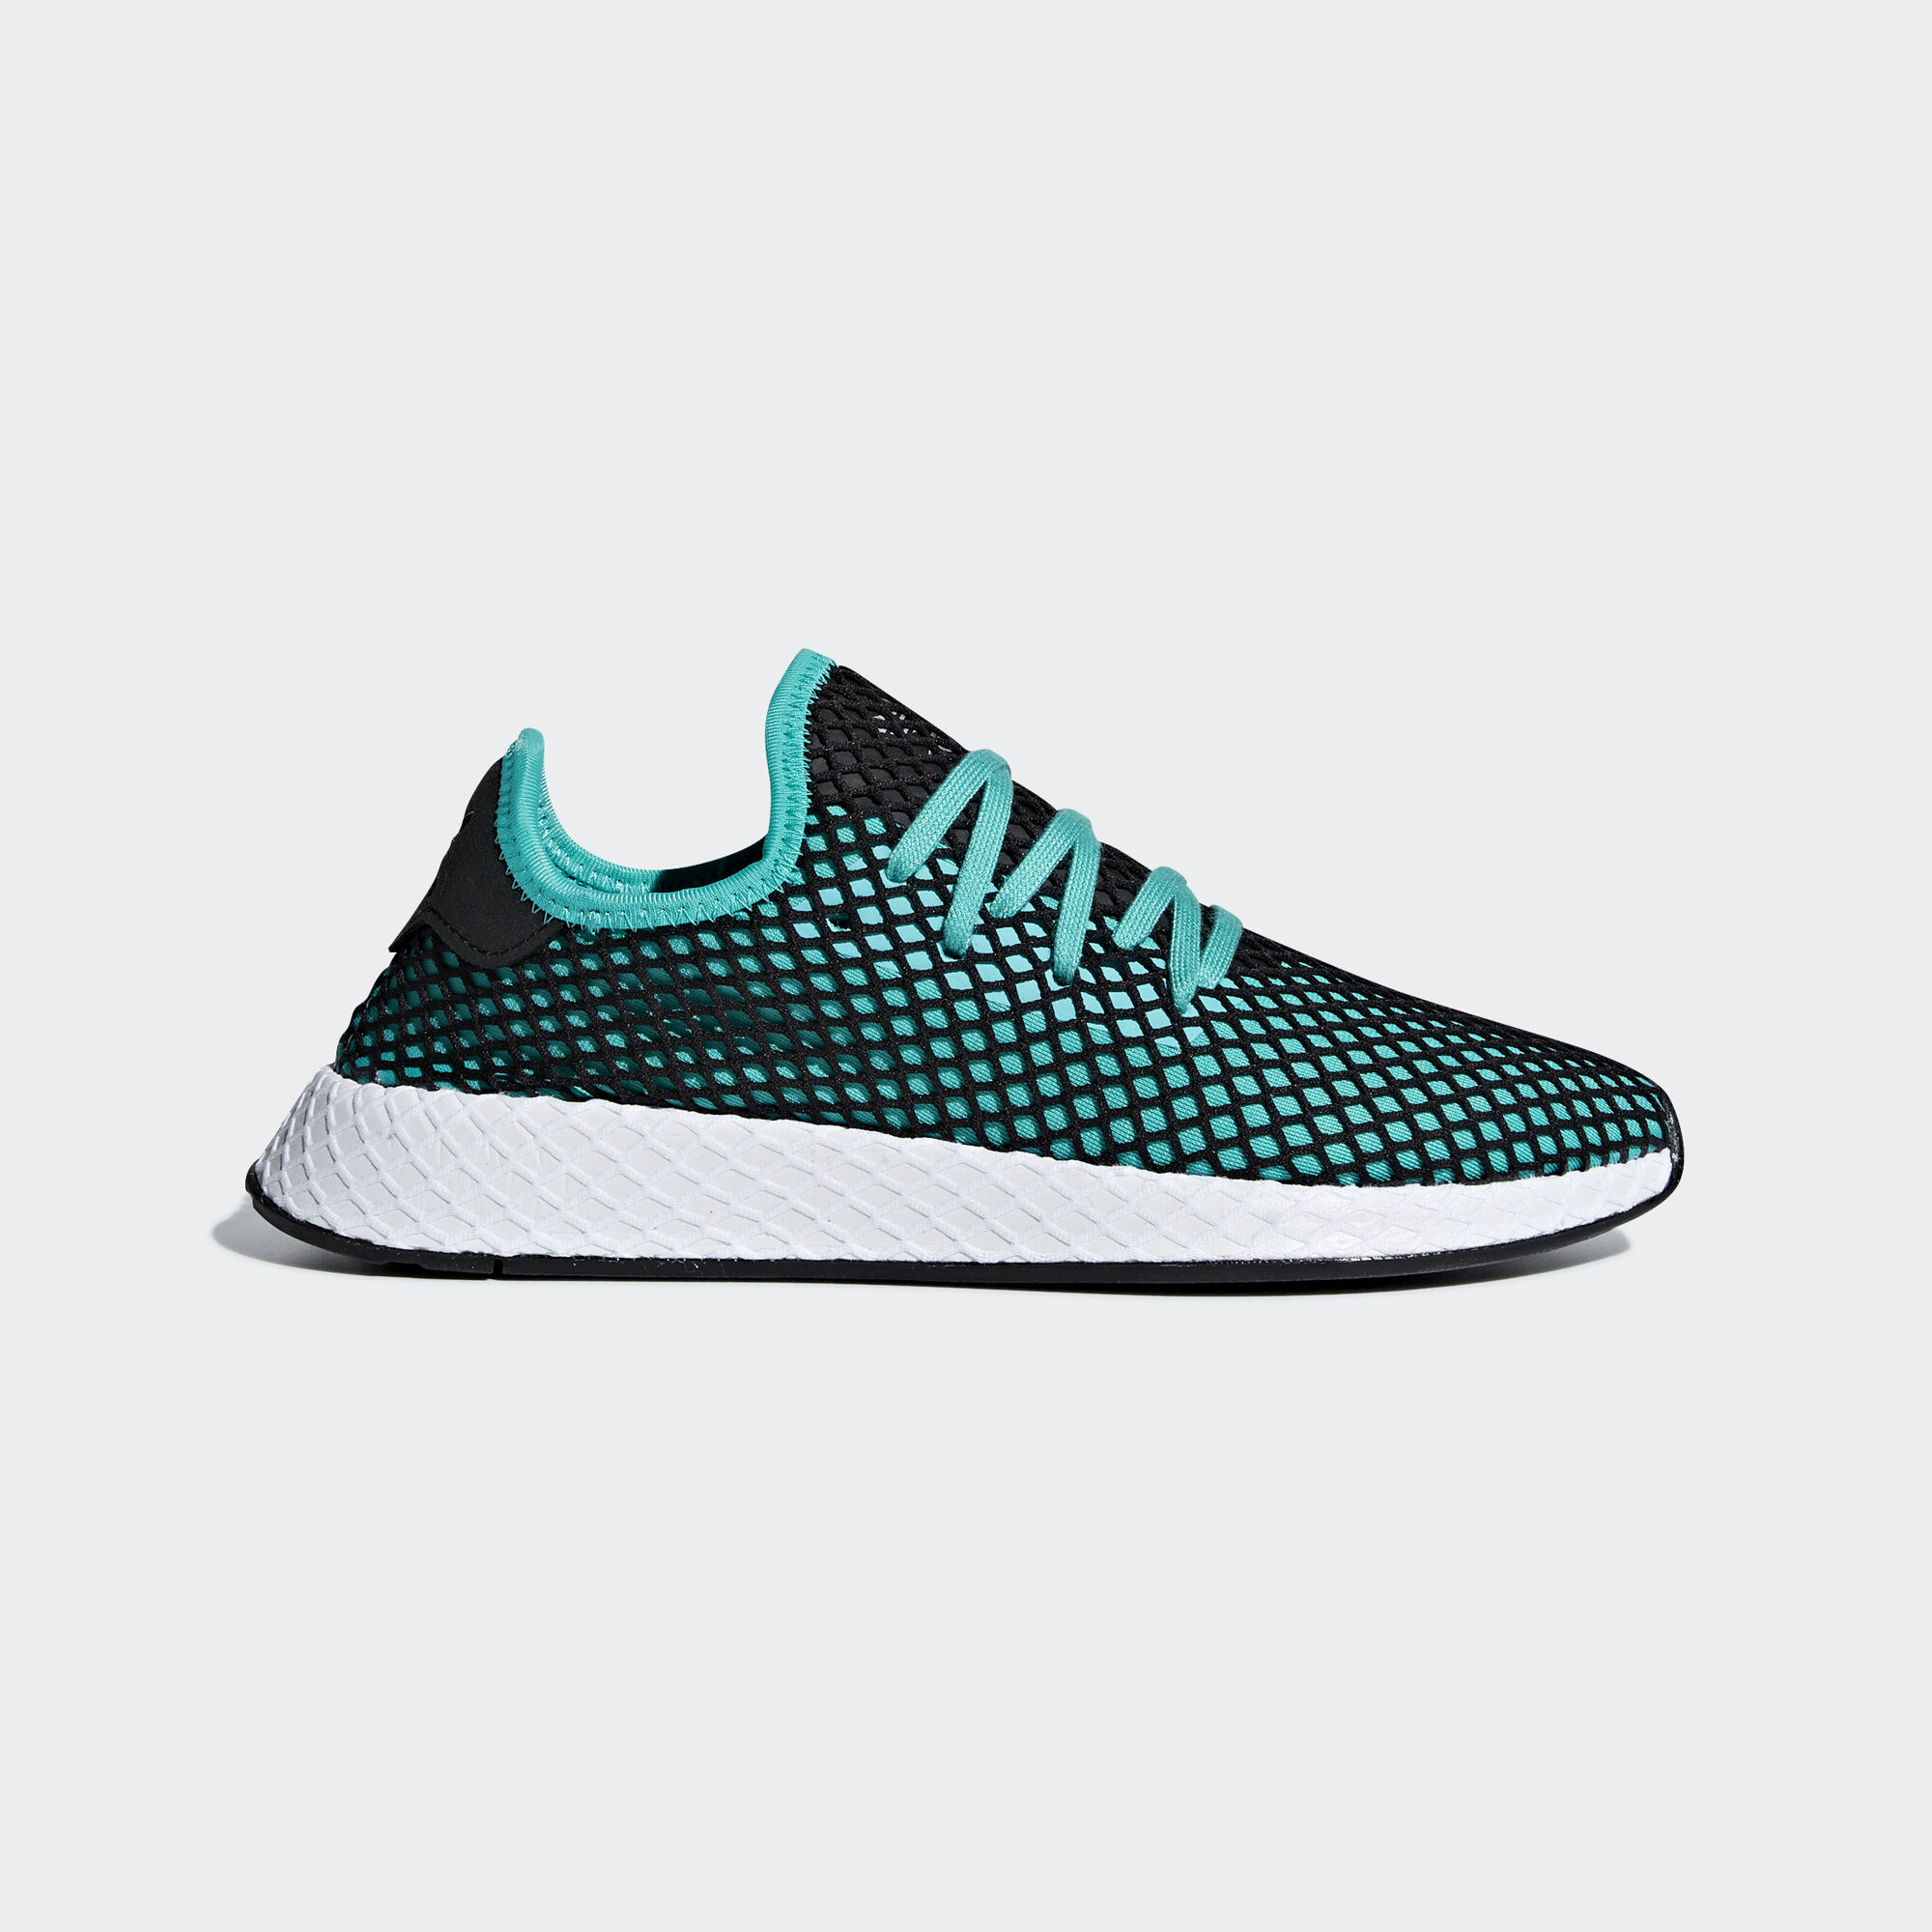 adidas deerupt runner scarpe adidas regionale turchese